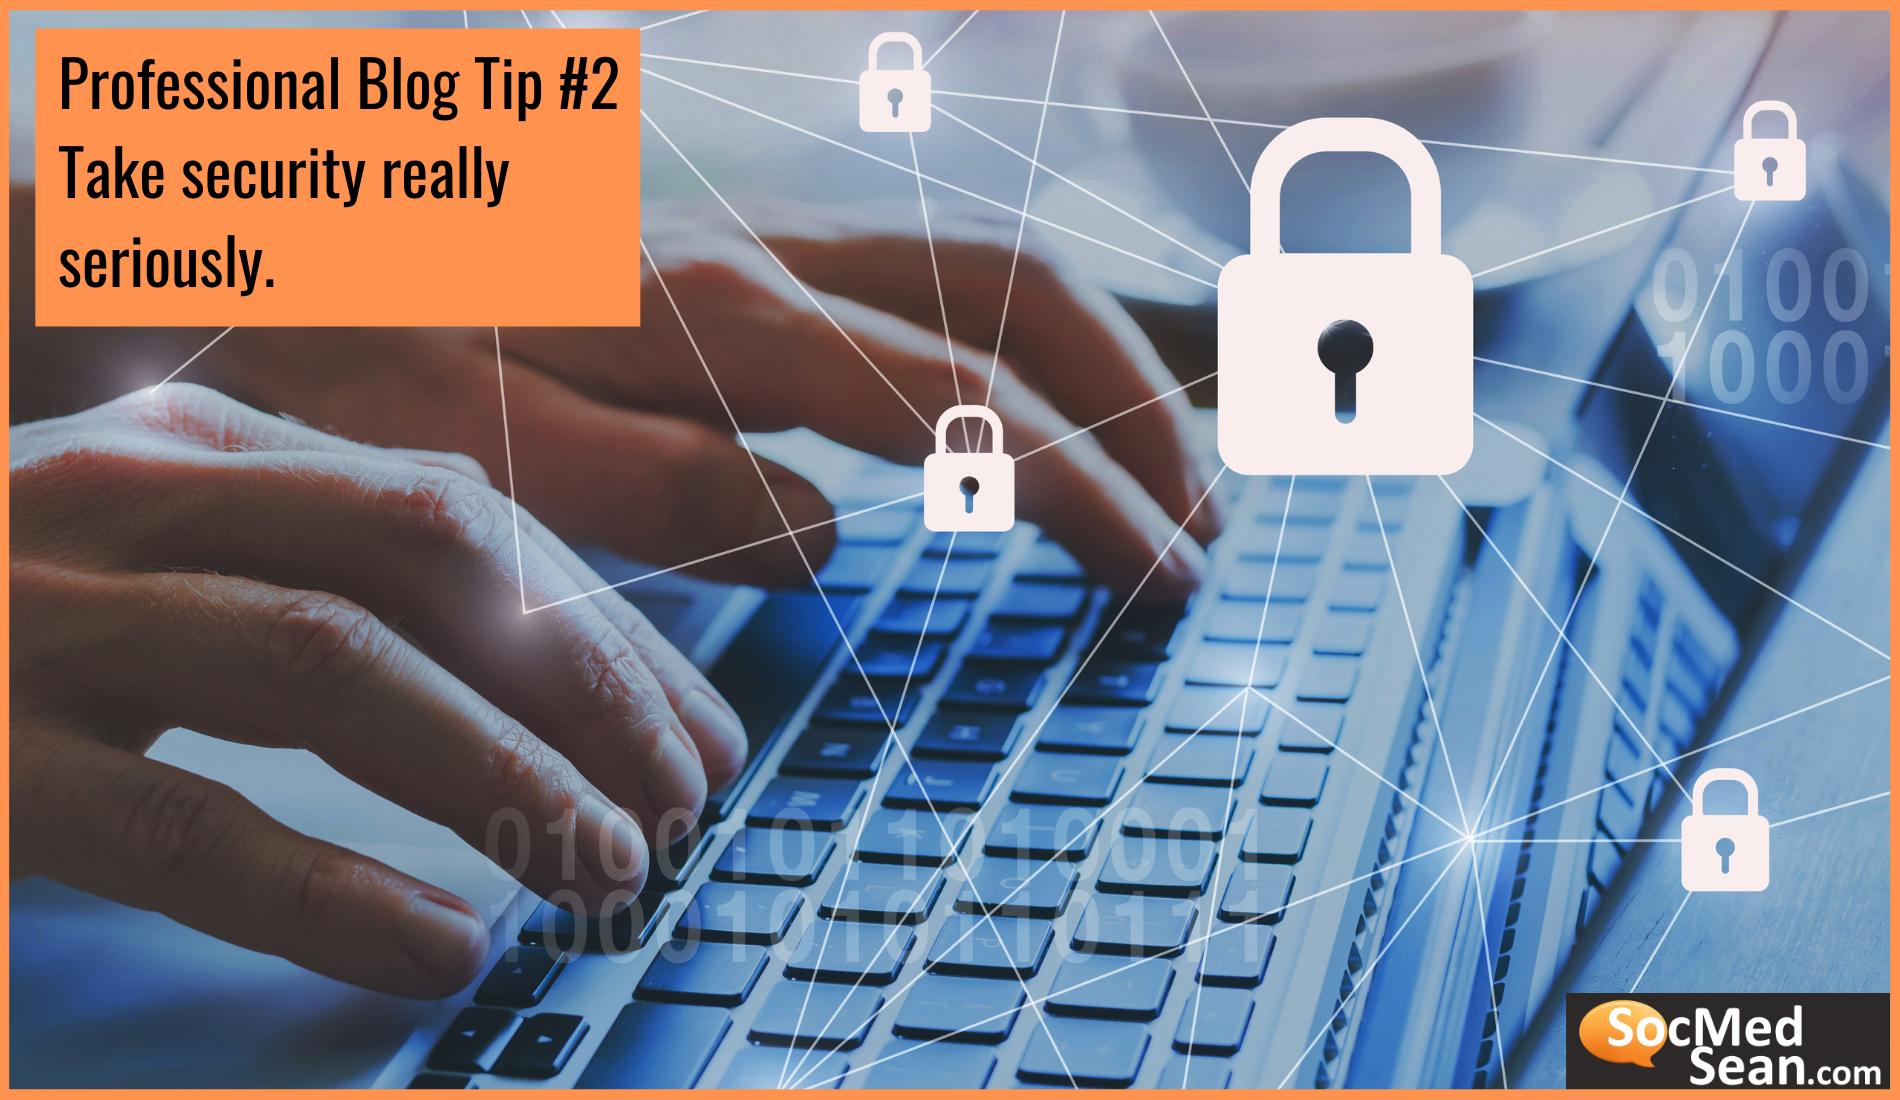 Blogging Tip - Take Security Seriously